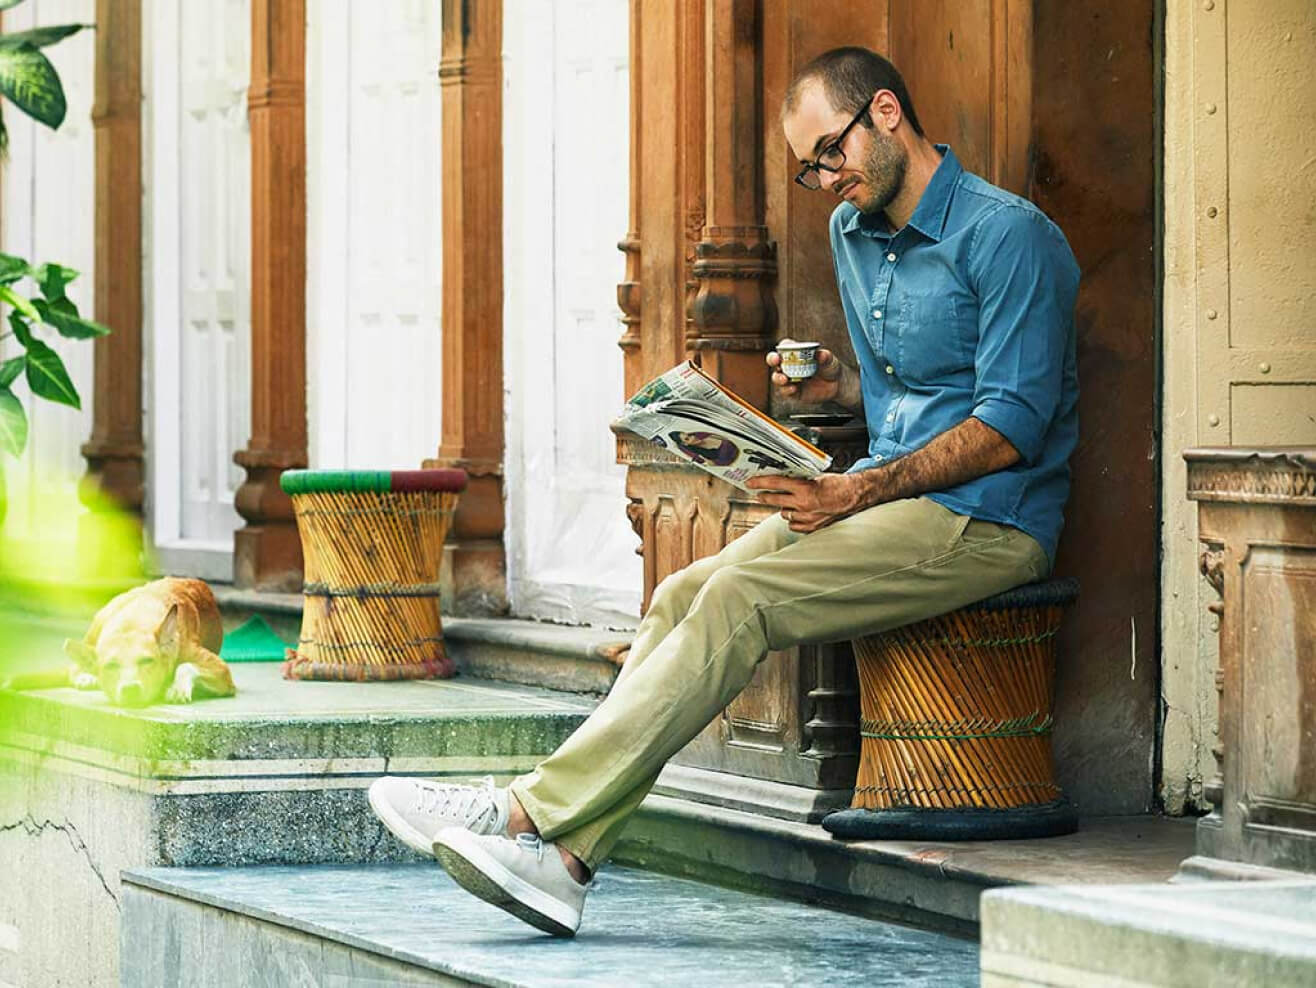 Scott Keyes drinking tea & reading newspaper.